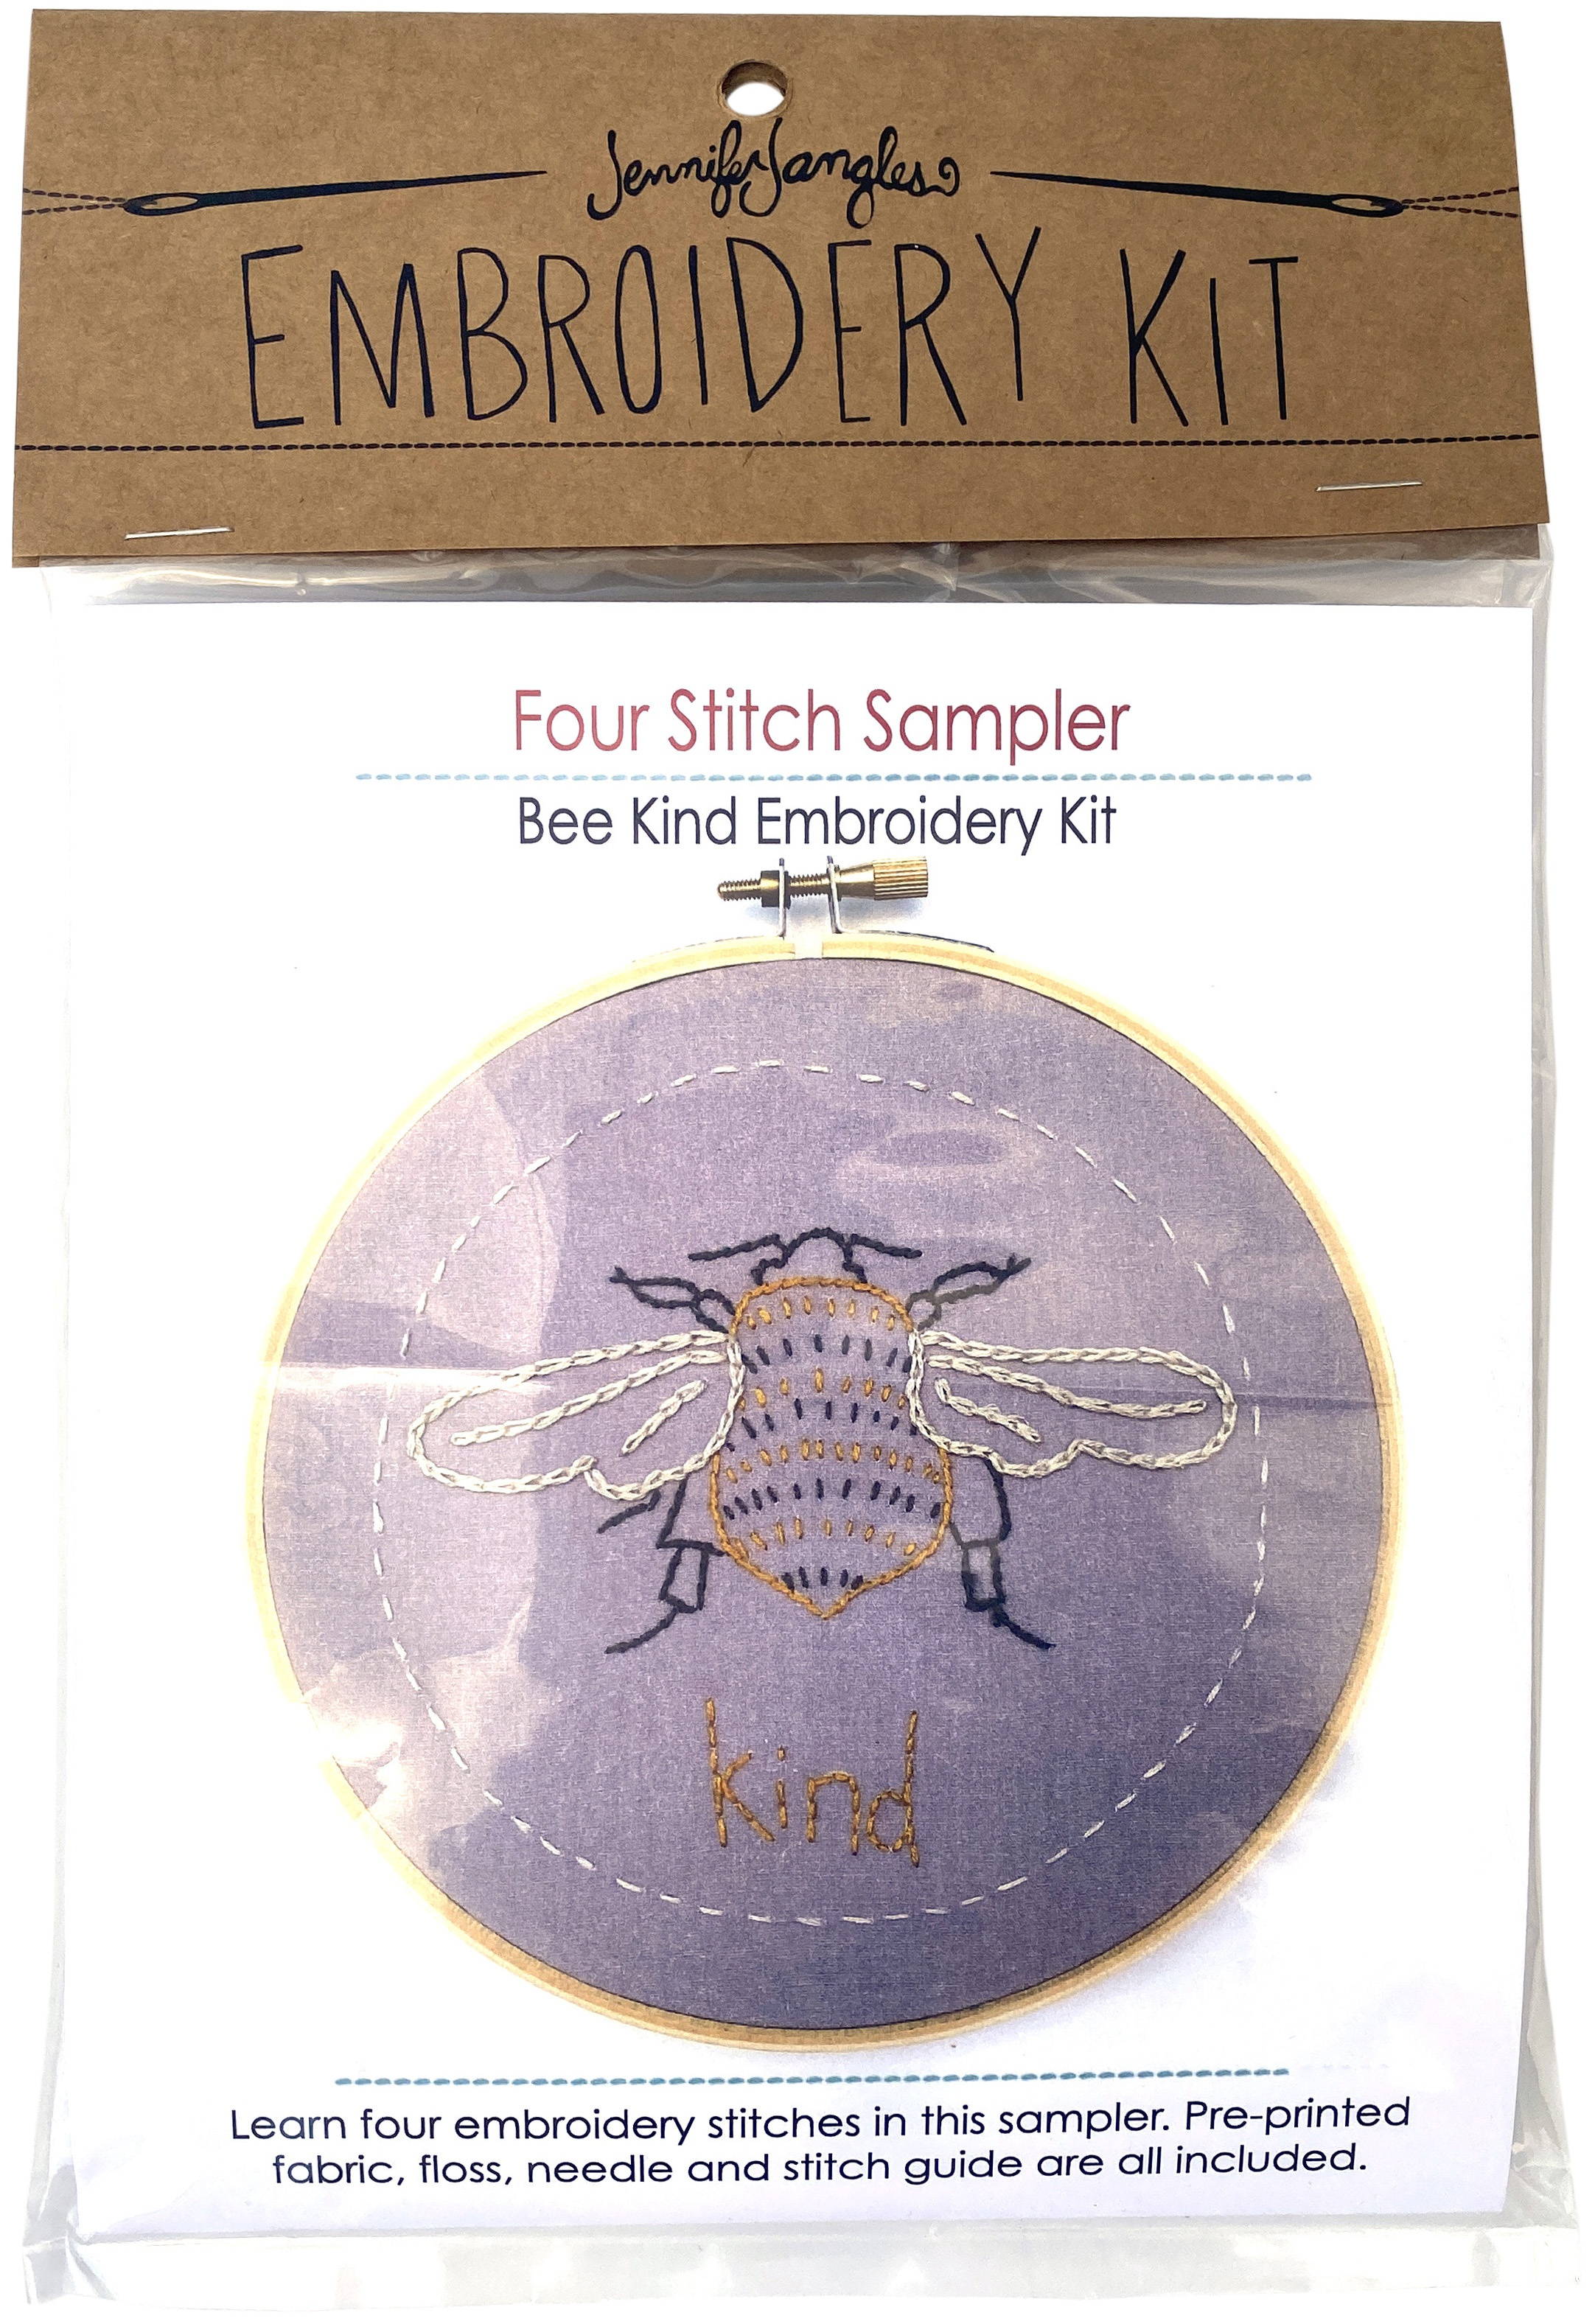 Jennifer Jangles Four Stitch Sampler Embroidery Kit-Bee Kind